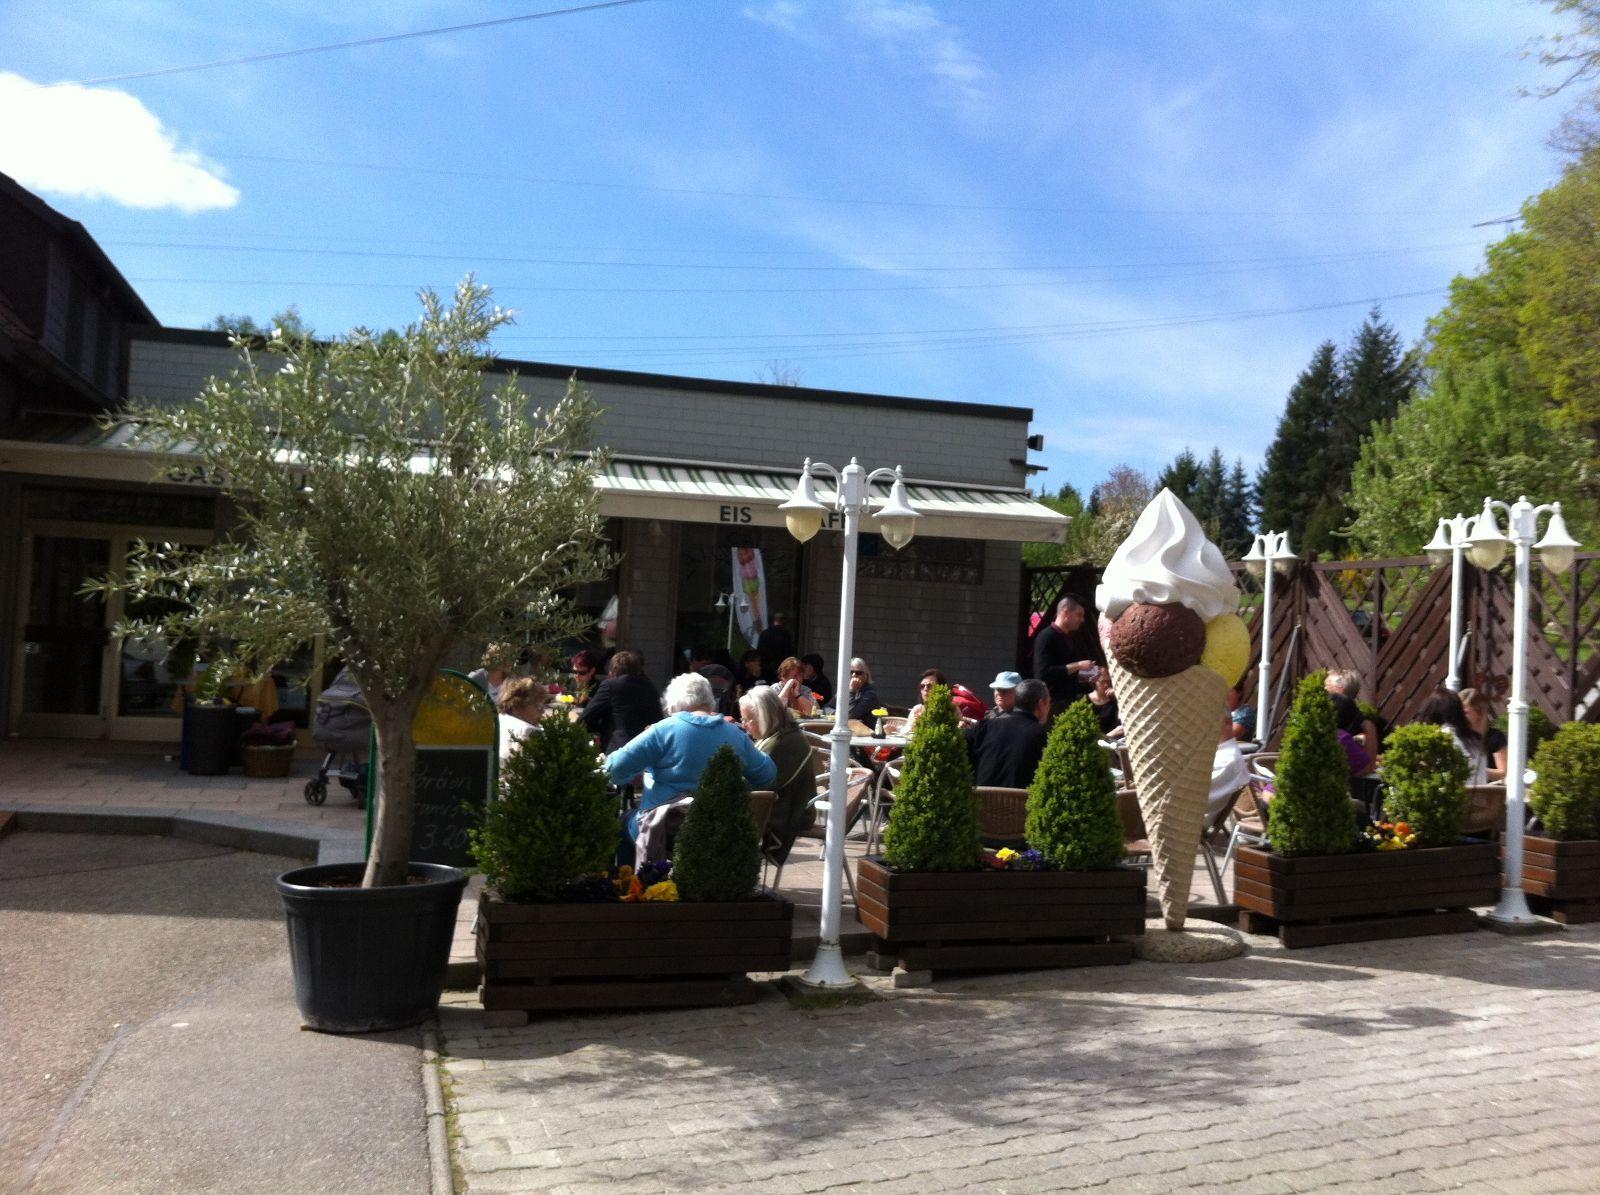 Eiscafe Ai Giardini Waldschenke Hubere in Birkenfeld, Baden ...